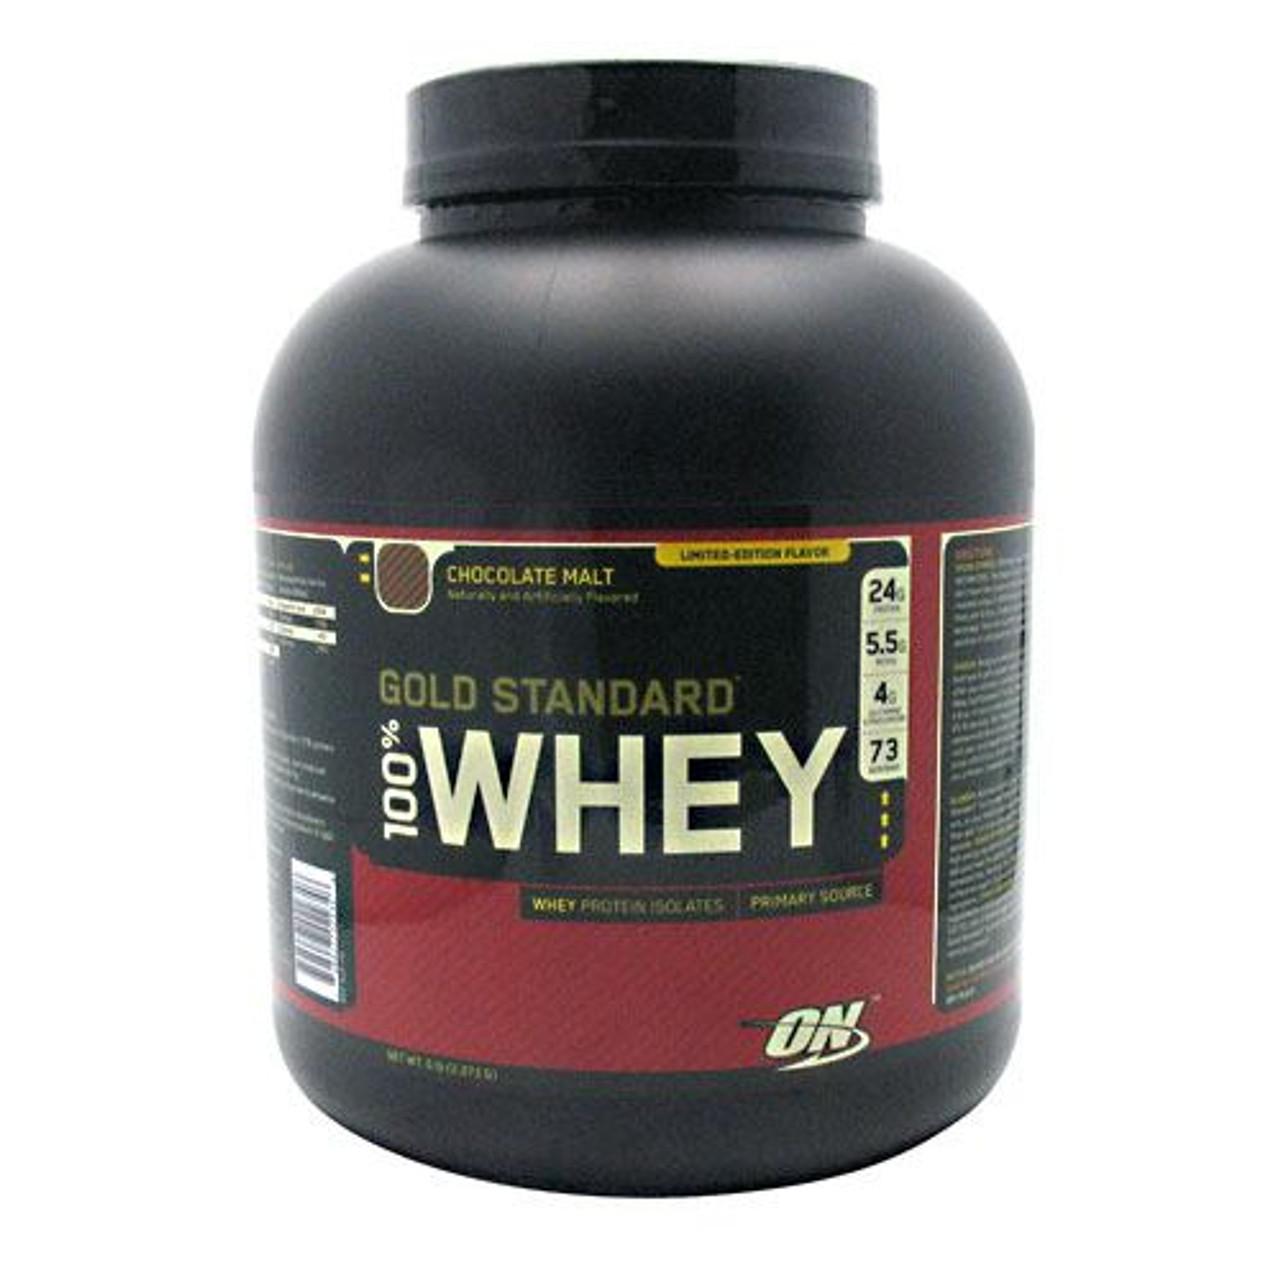 100% Whey Gold Standard 5lb Optimum Nutrition